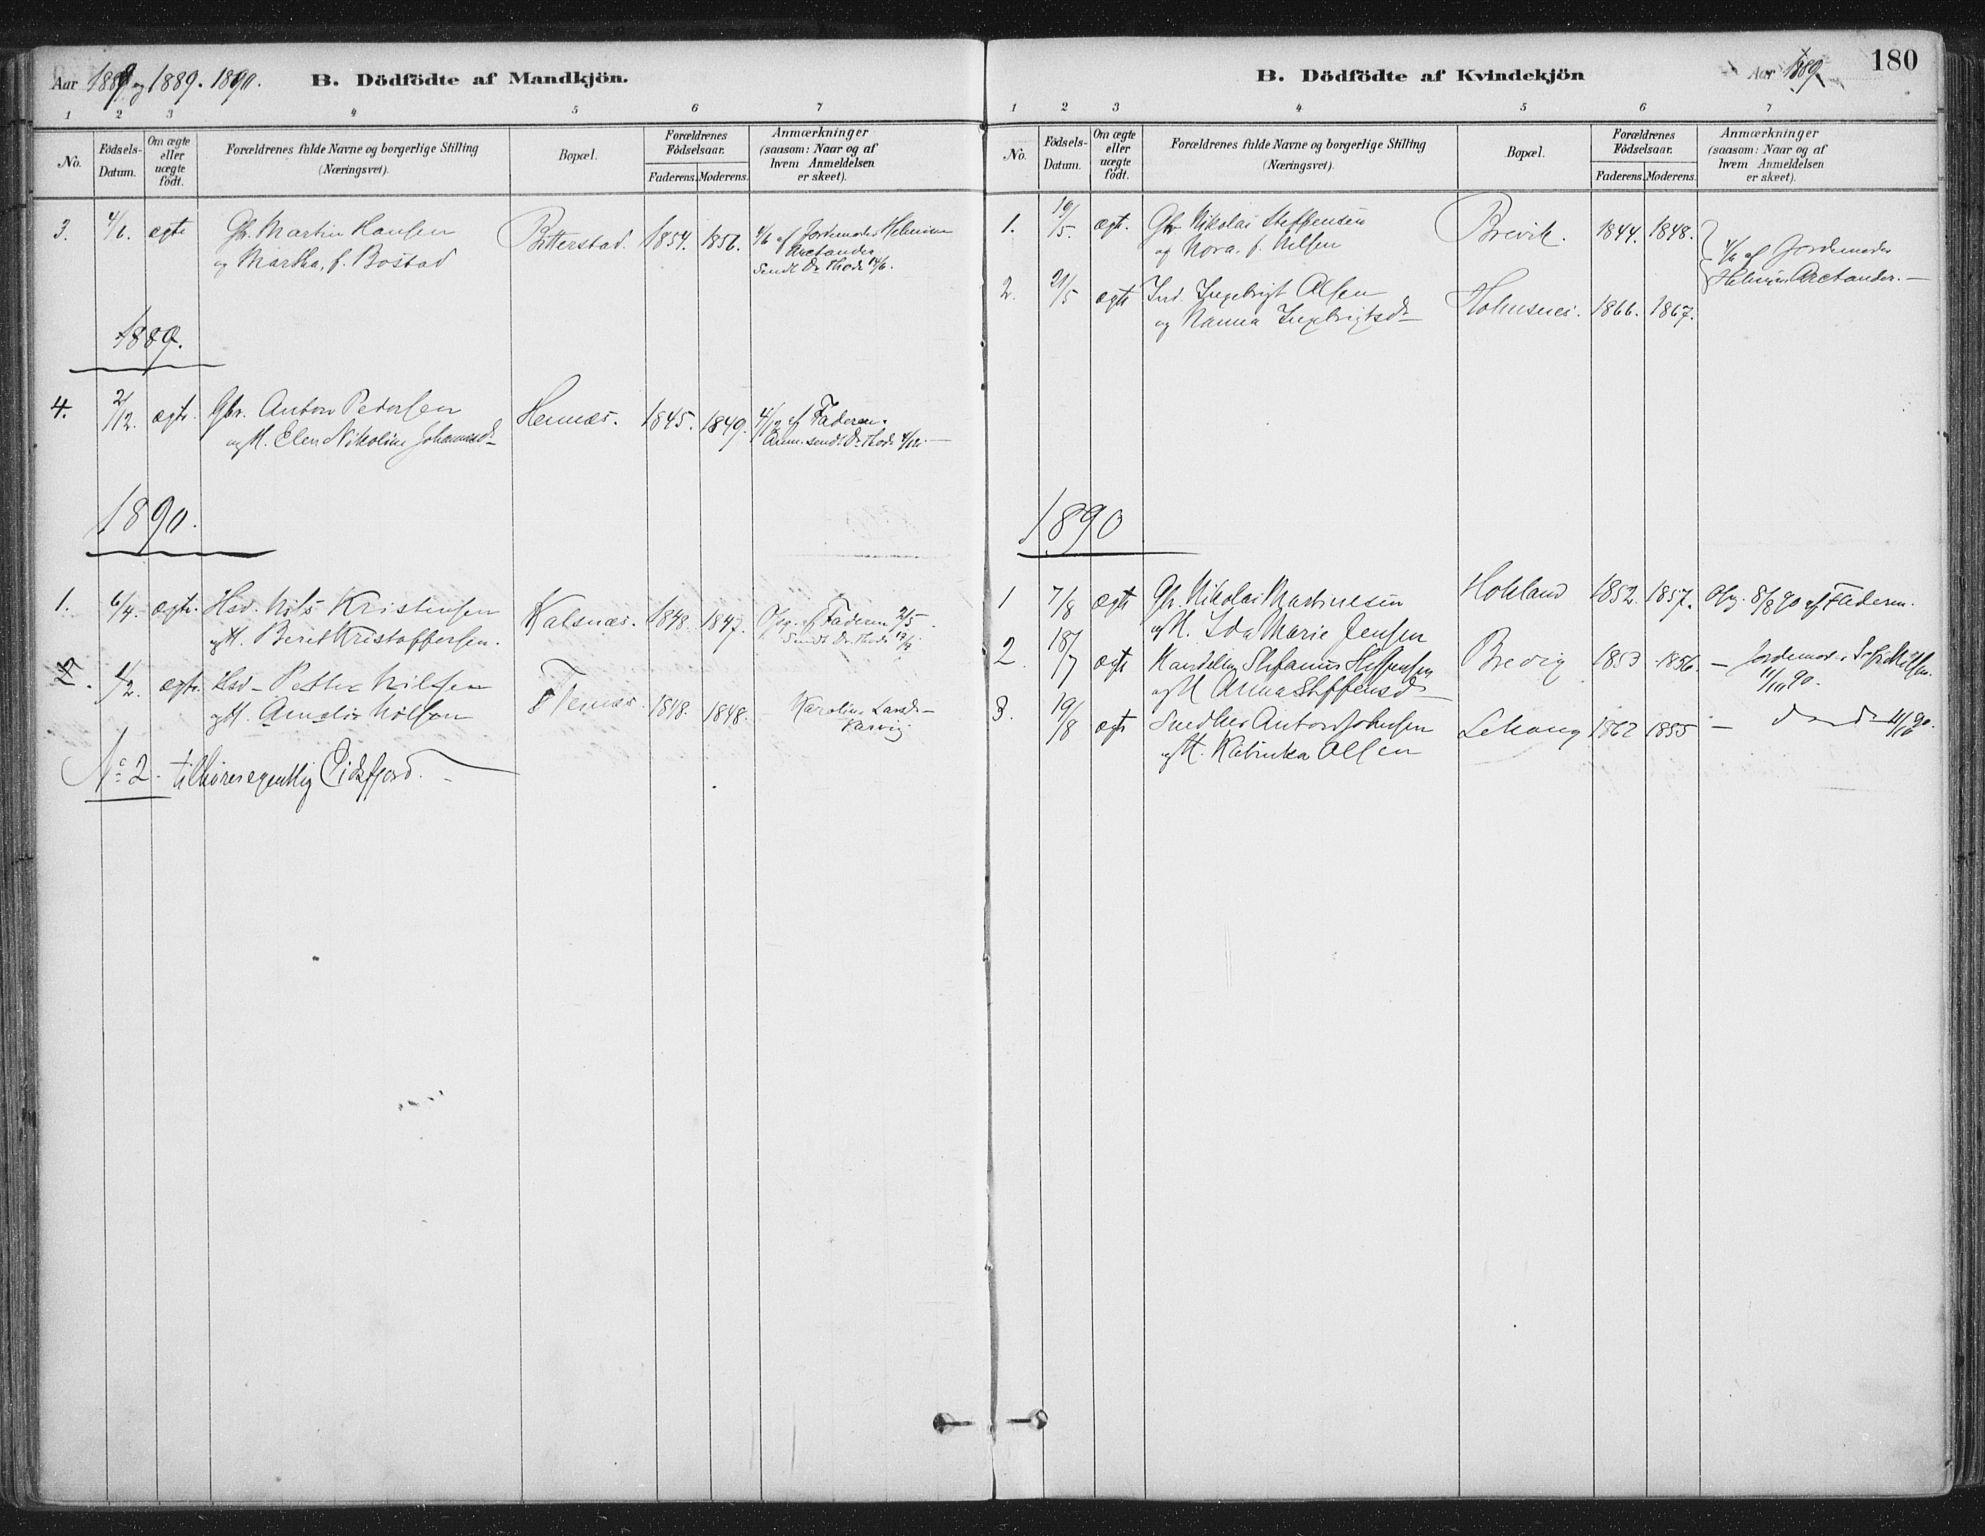 SAT, Ministerialprotokoller, klokkerbøker og fødselsregistre - Nordland, 888/L1244: Ministerialbok nr. 888A10, 1880-1890, s. 180